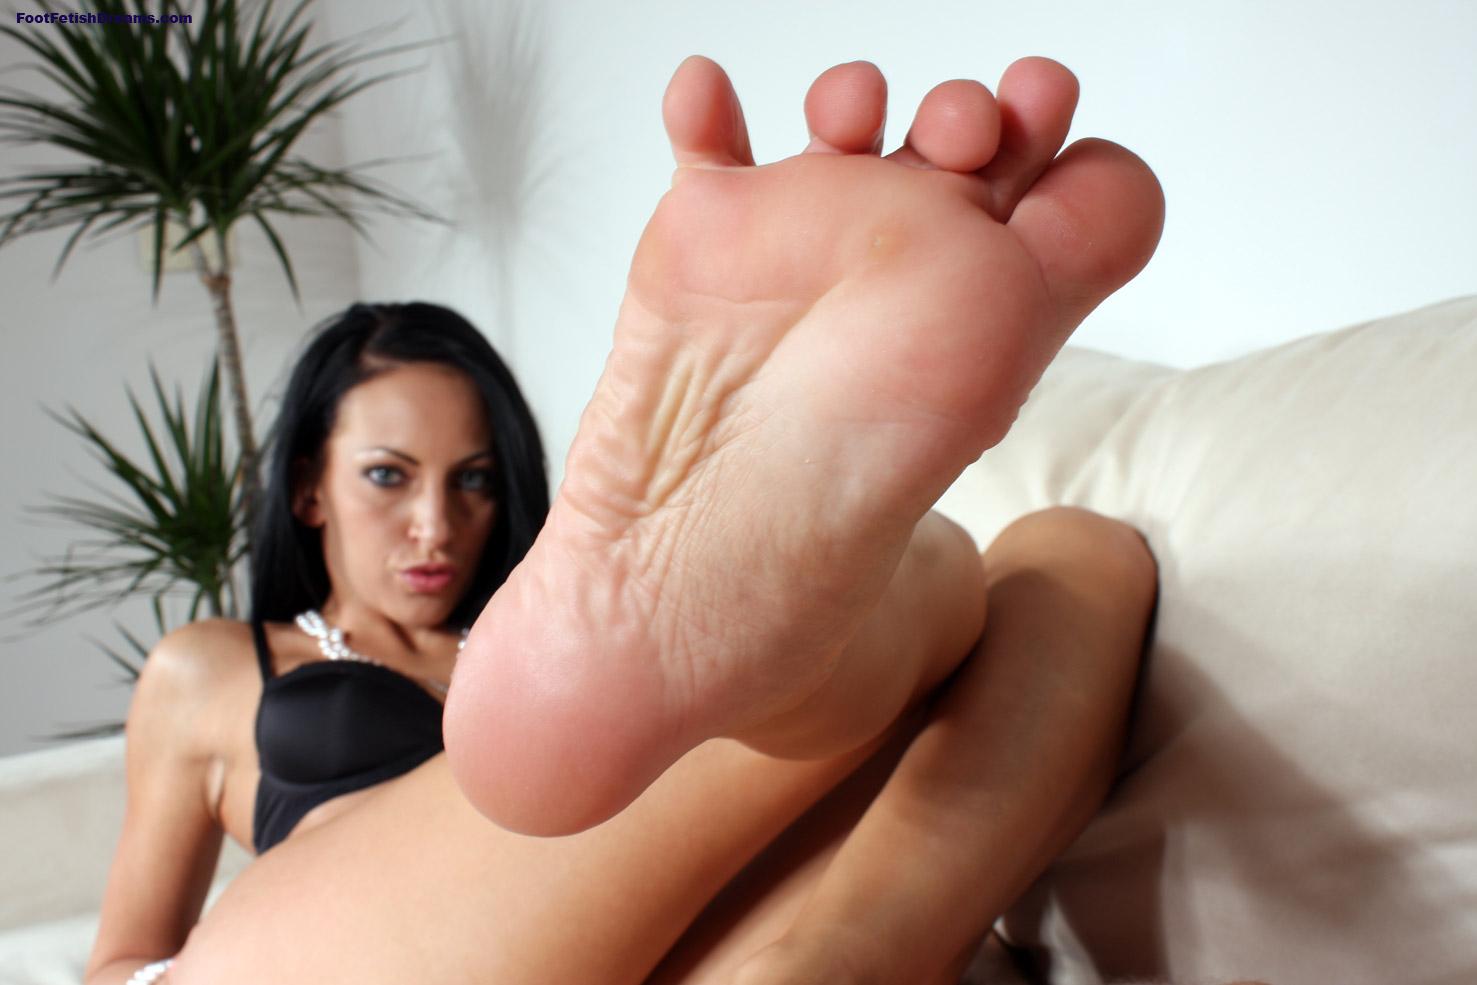 footjob london escort porn video